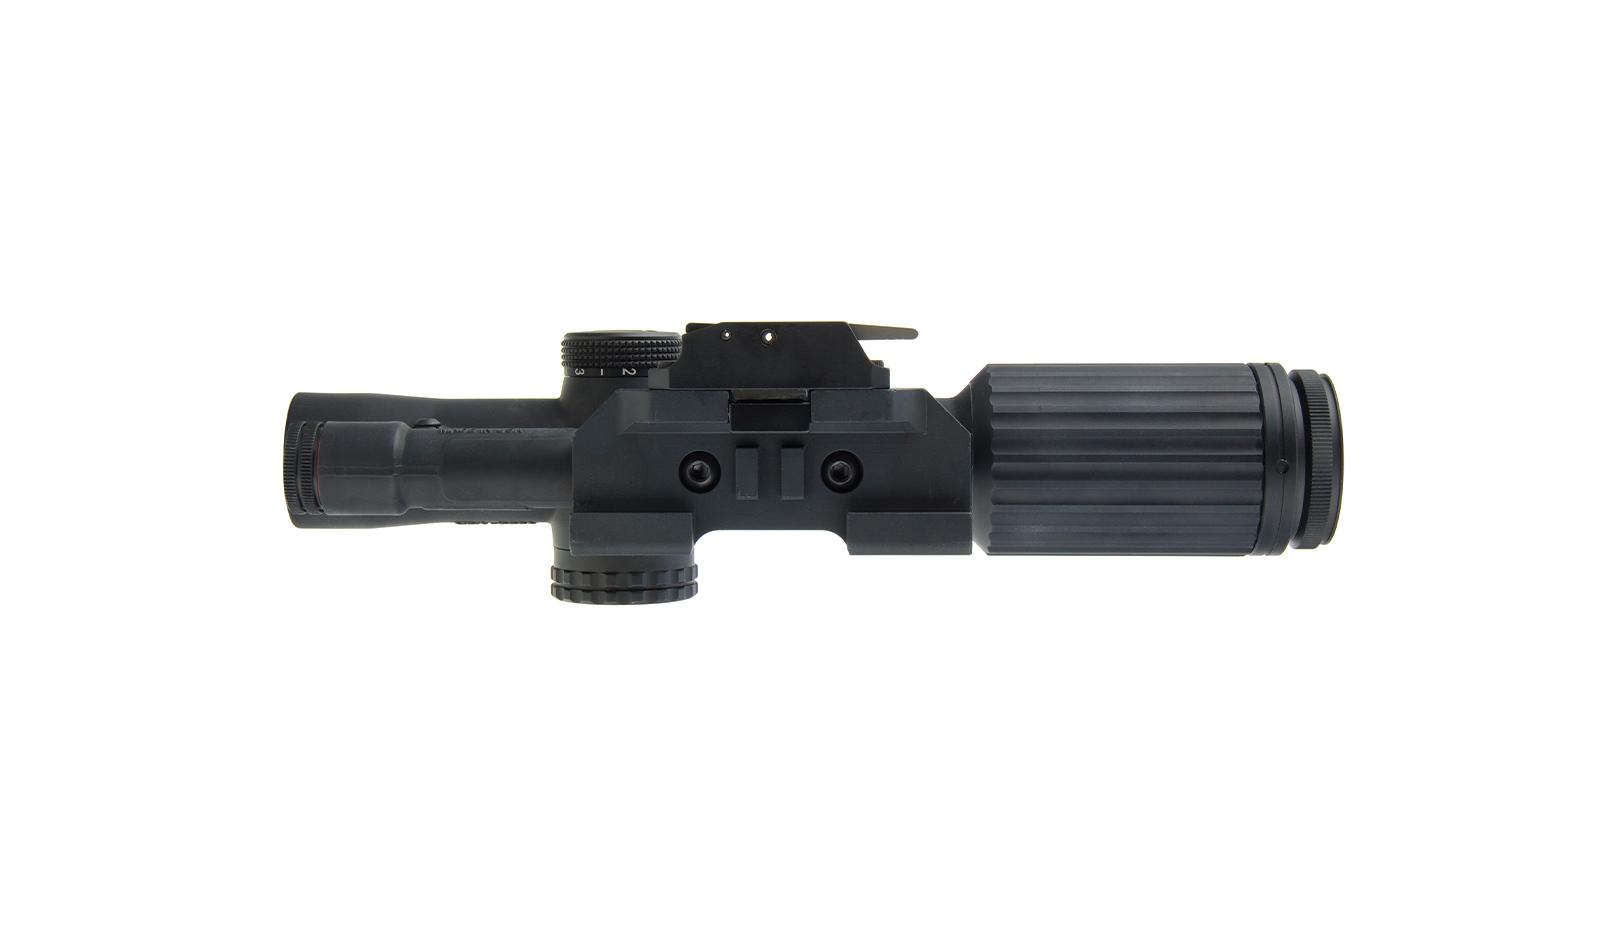 VC16-C-1600008 angle 10